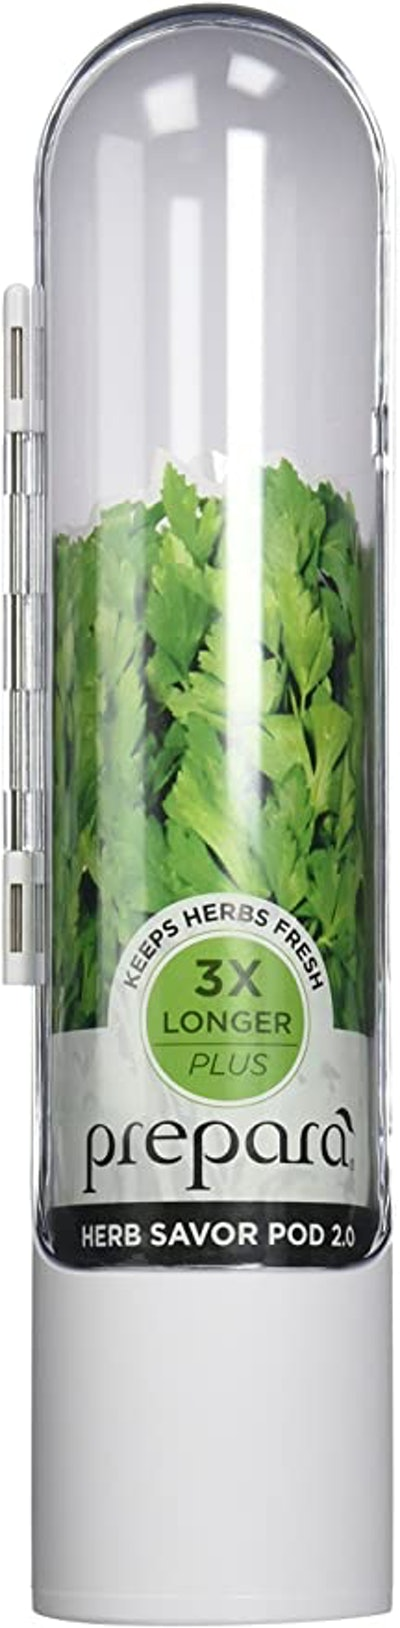 Prepara Herb Savor Pod